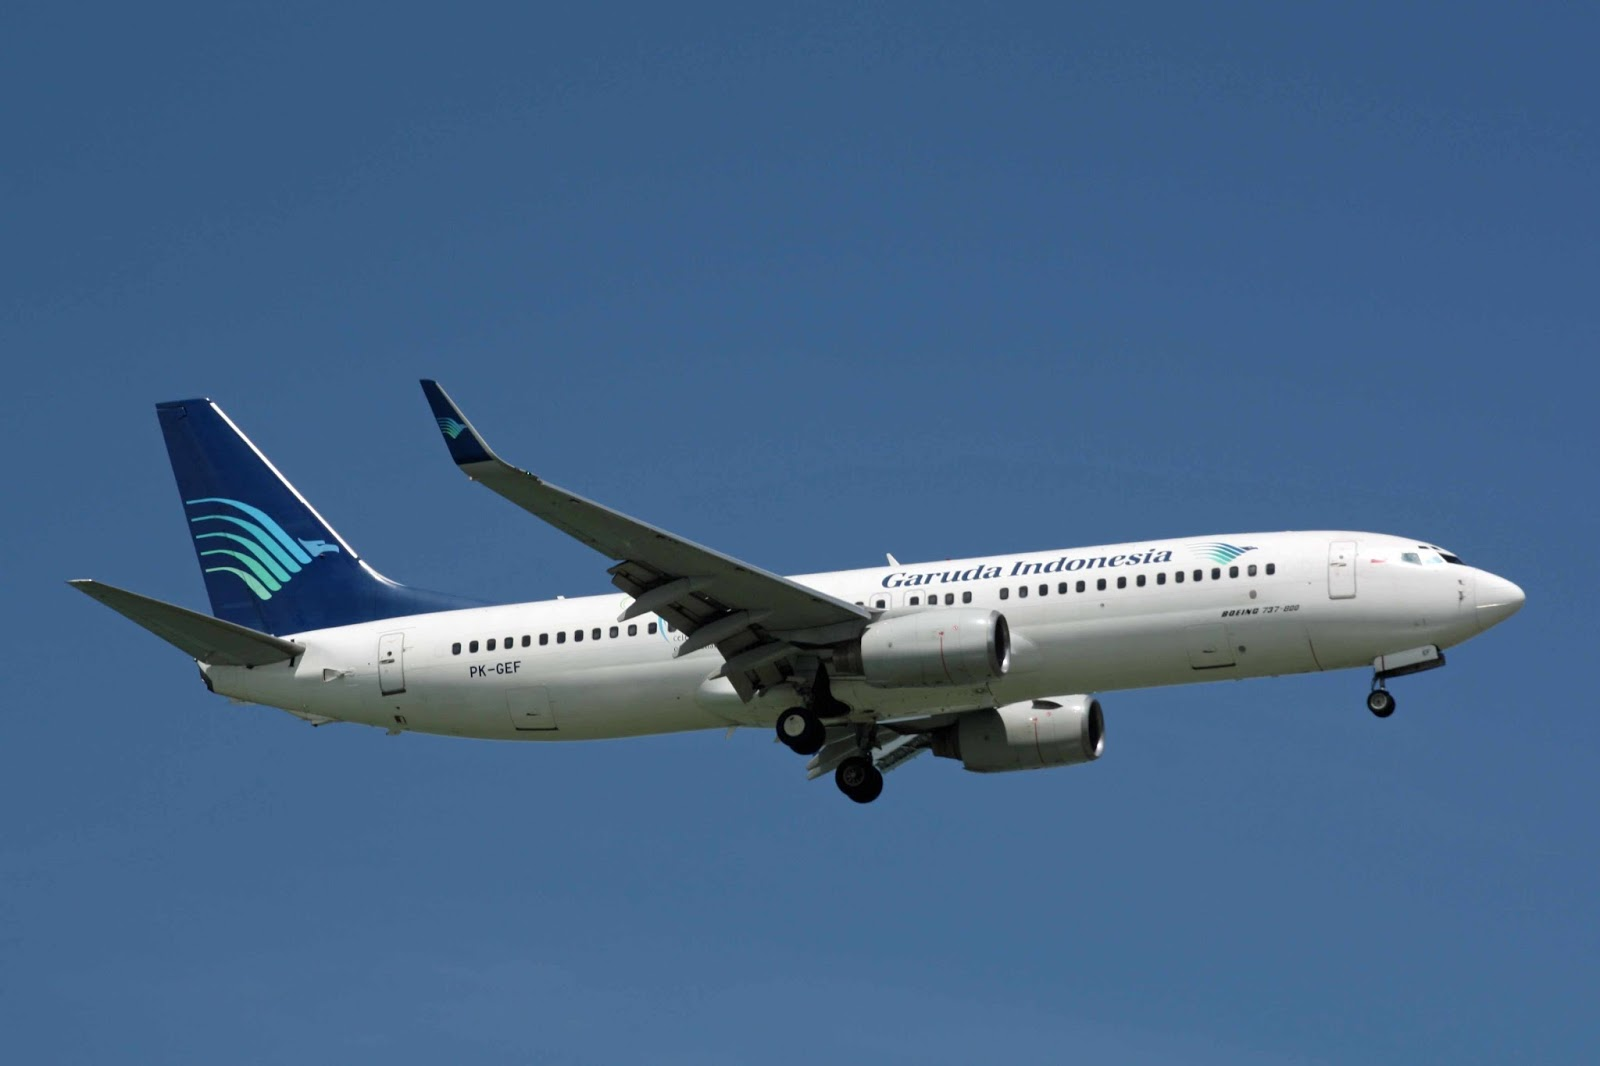 Foto Gambar Pesawat Terbang Angkutan Penumpang Garuda Indonesia Airways